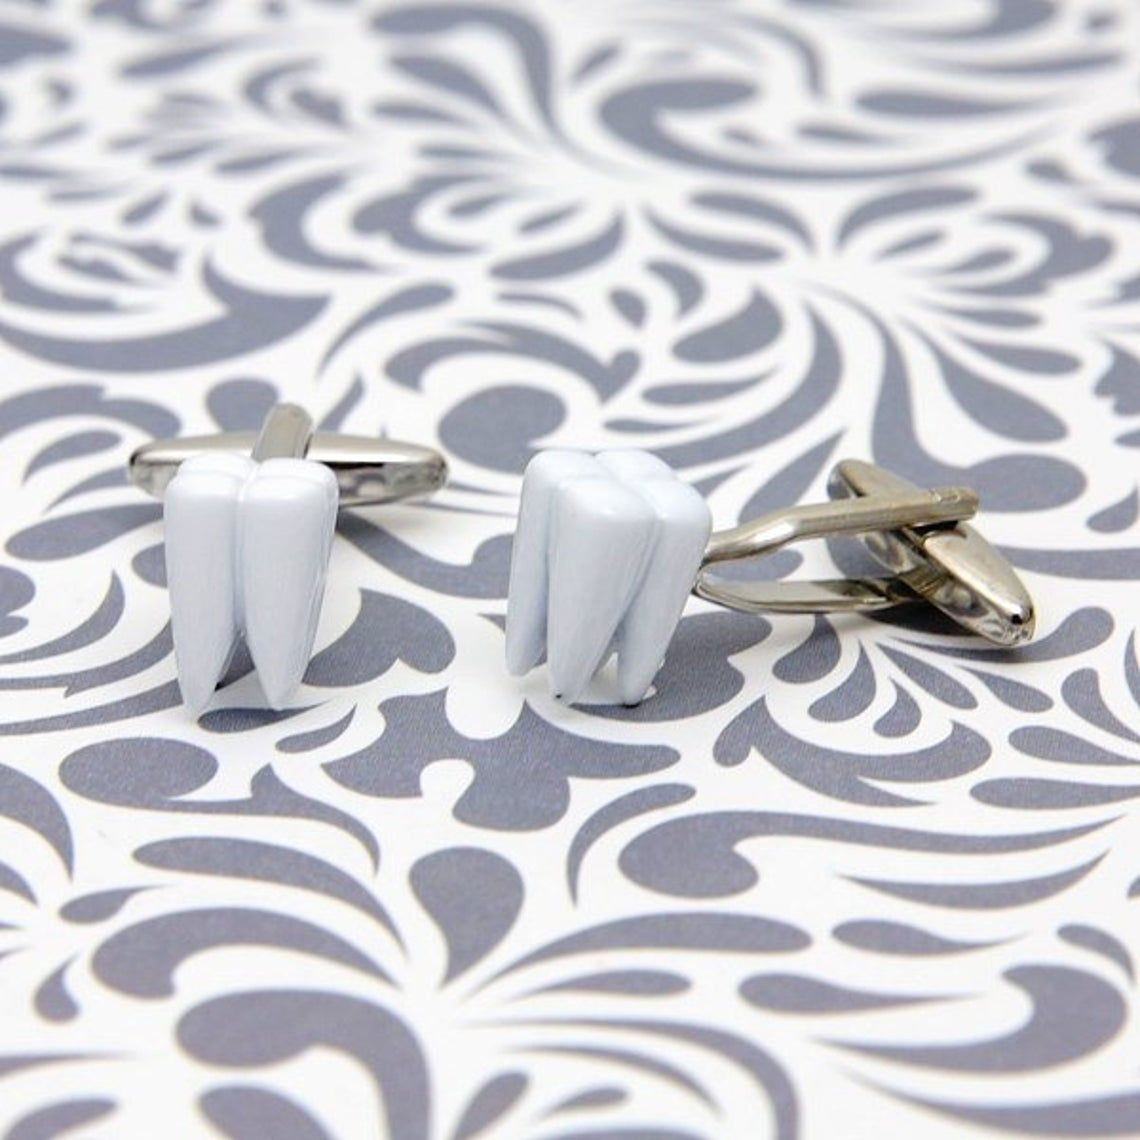 Dentist Cuff Links